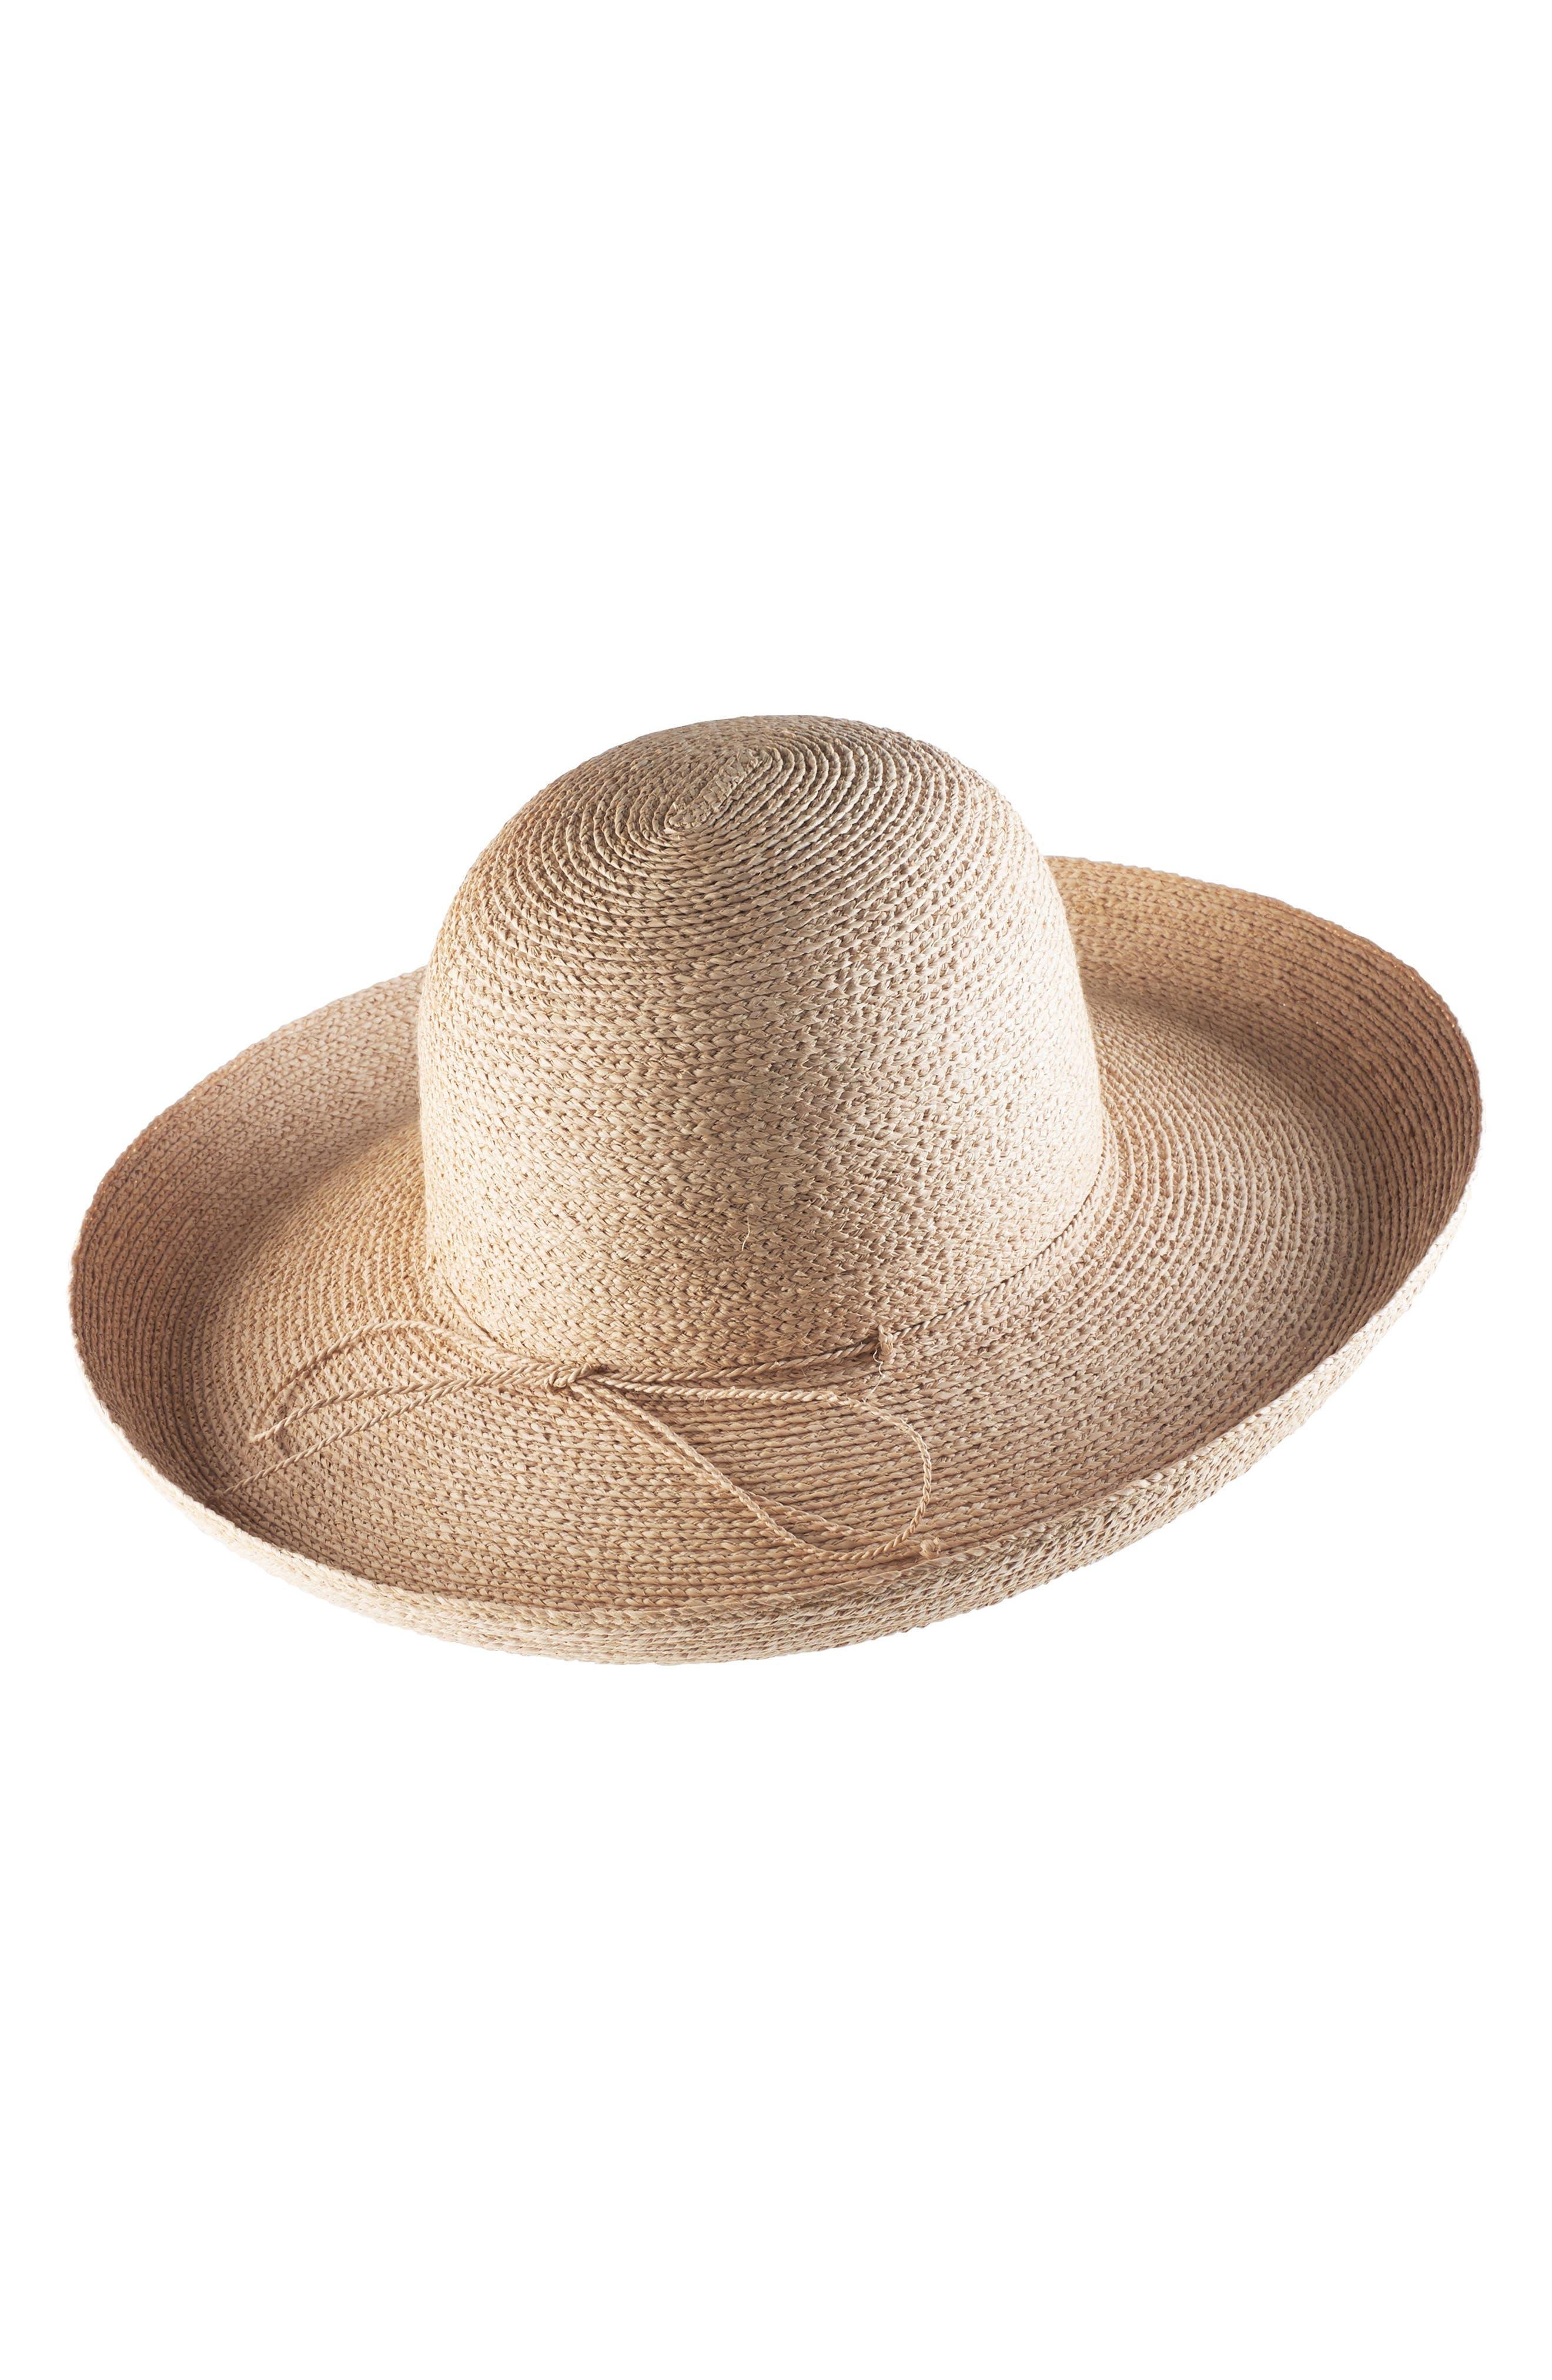 Rolled Brim Raffia Hat,                             Alternate thumbnail 2, color,                             Natural